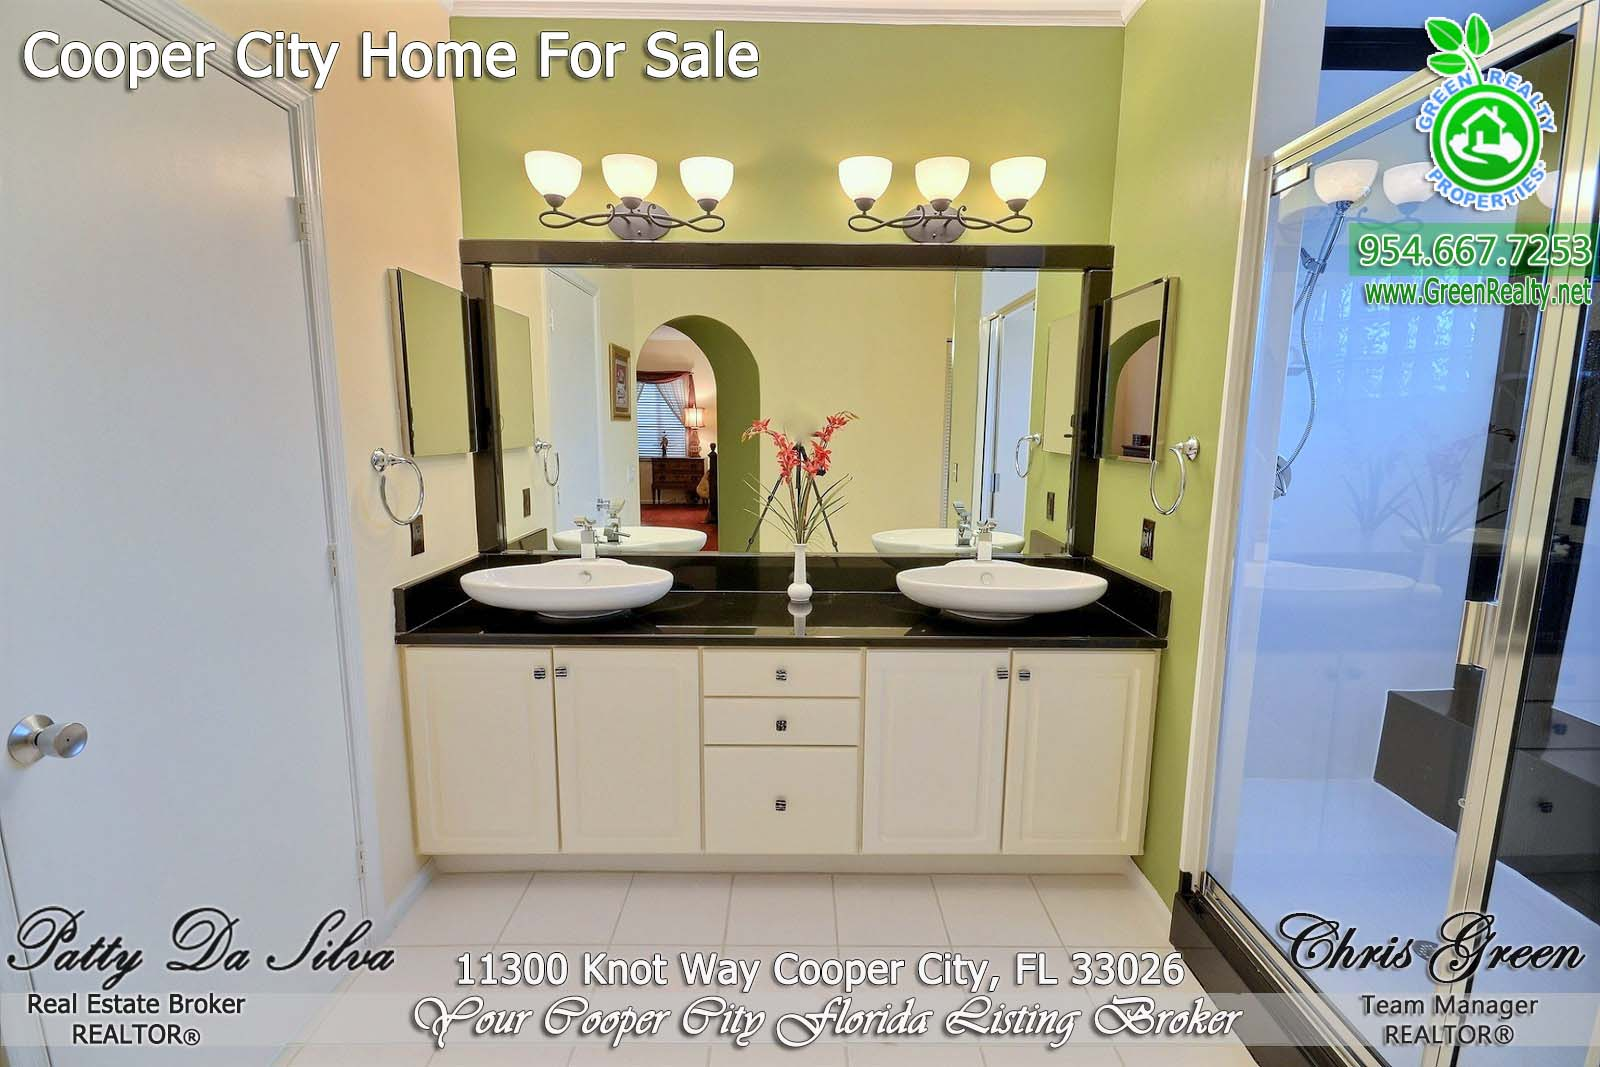 37 Homes For Sale in East Landing Rock Creek (4)